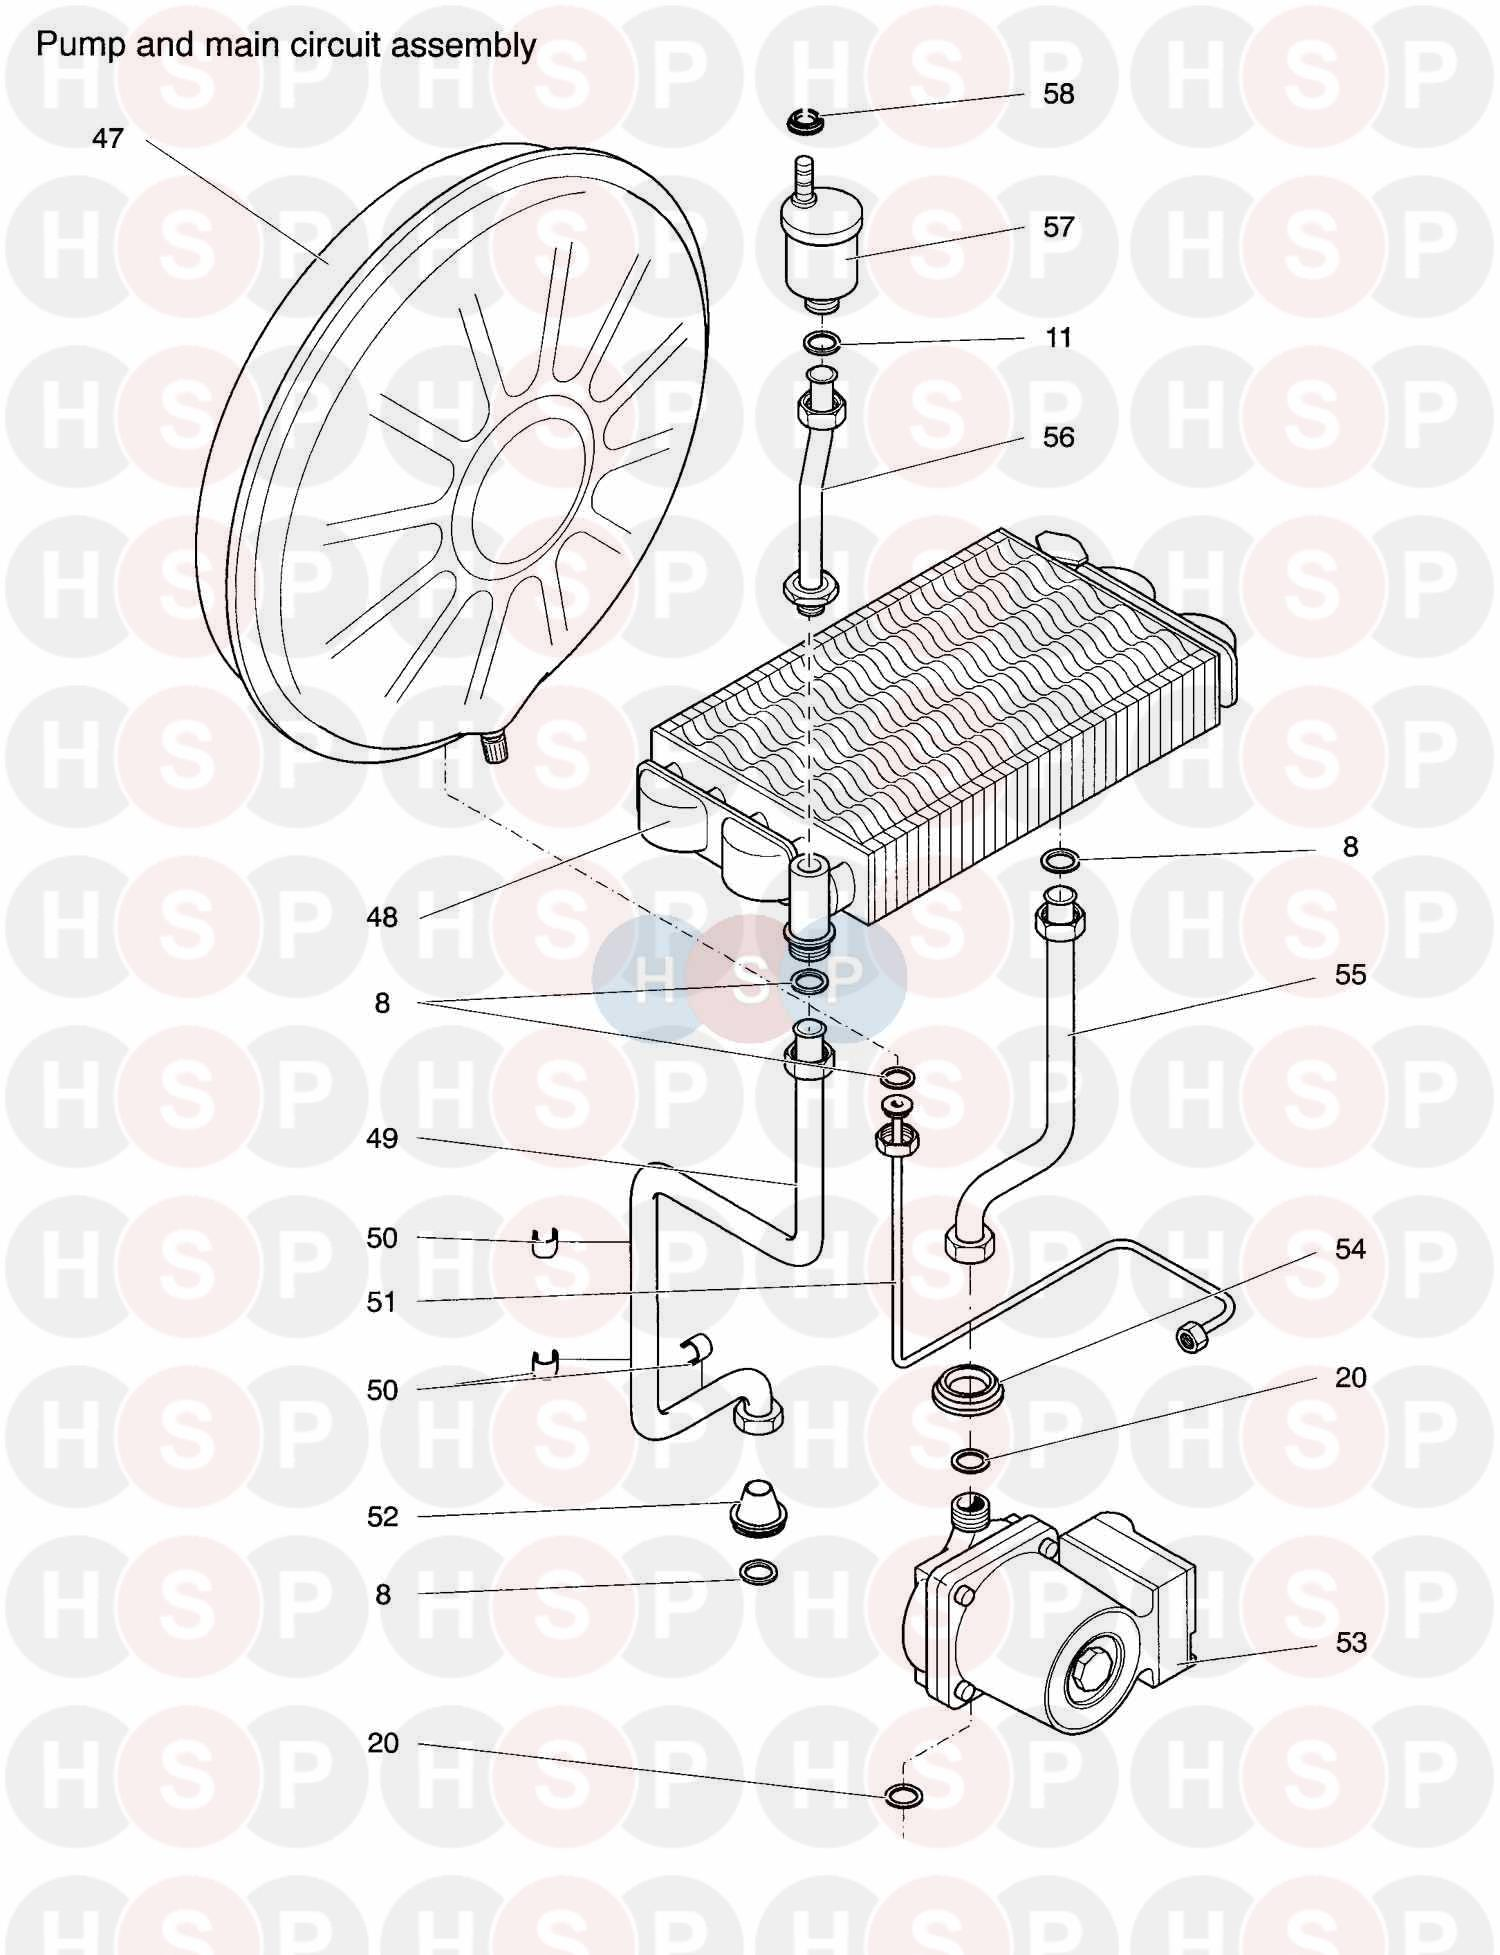 Wiring Diagram For Telemecanique Xmp Pressure Switch : Square d water pressure switch wiring diagram the best